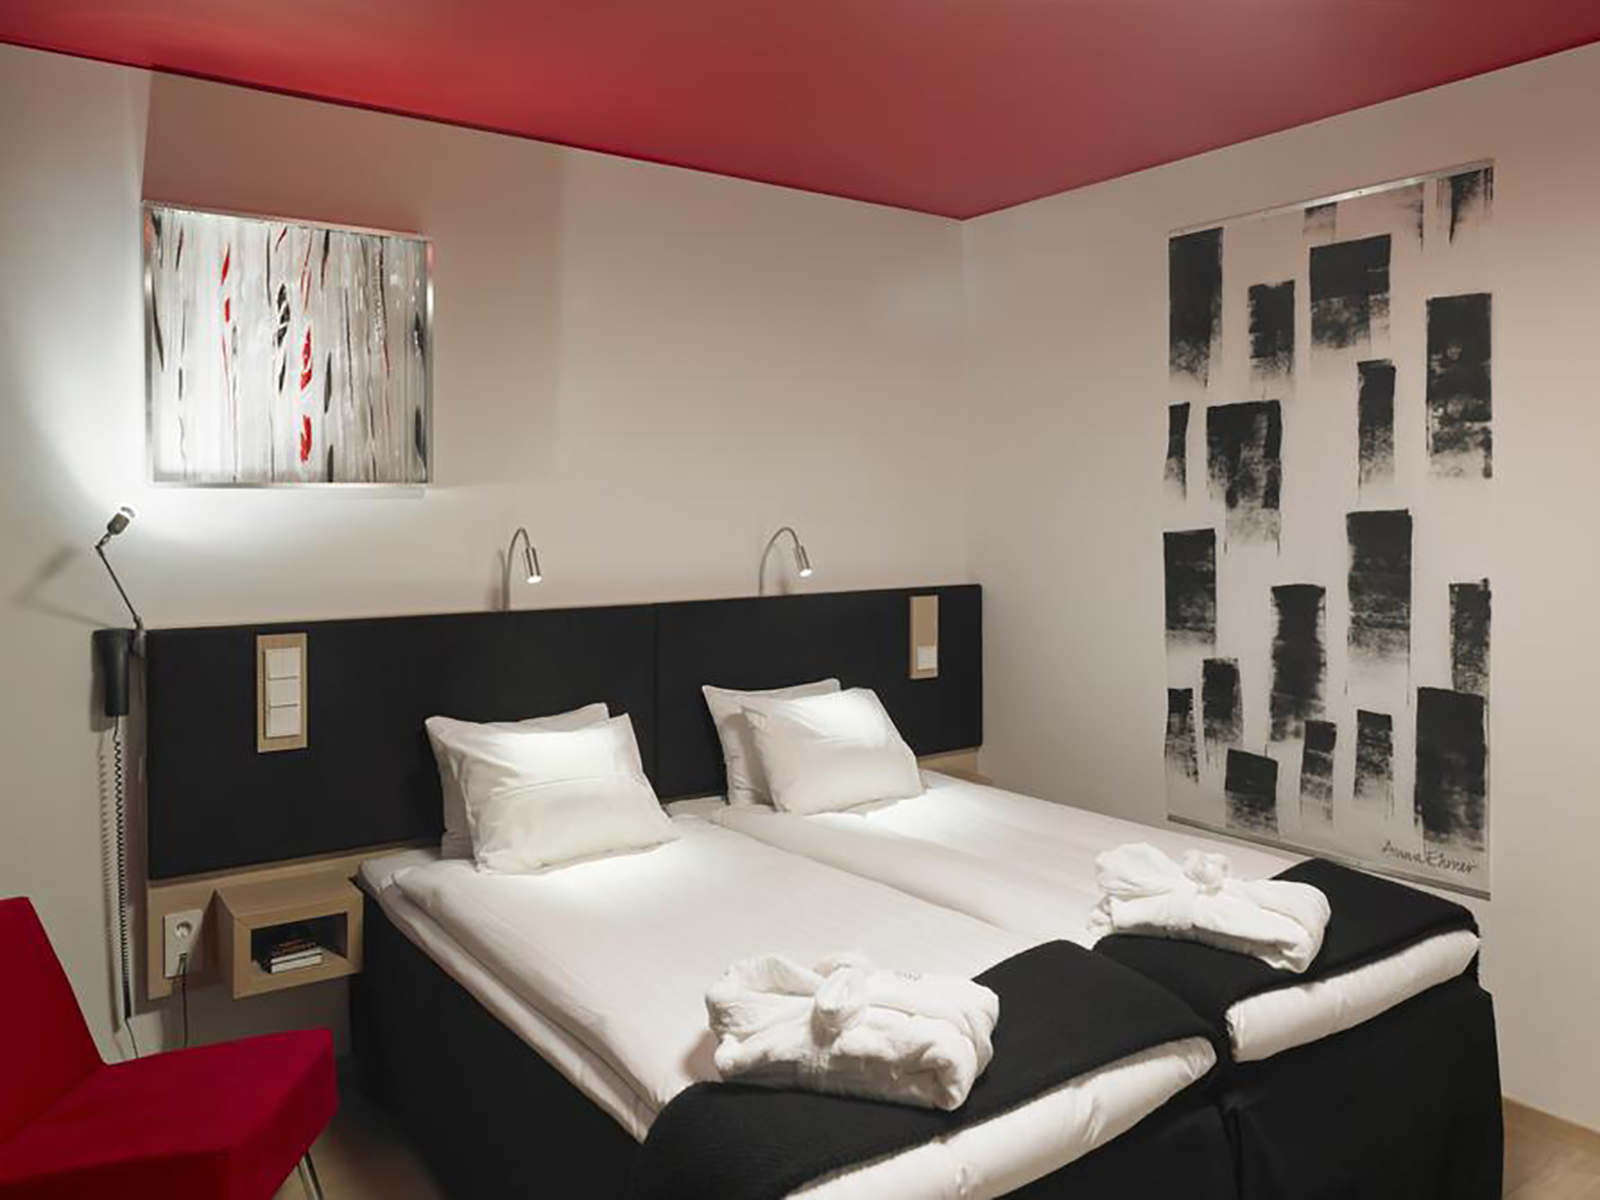 Erbjudande Kosta Boda Art Hotel